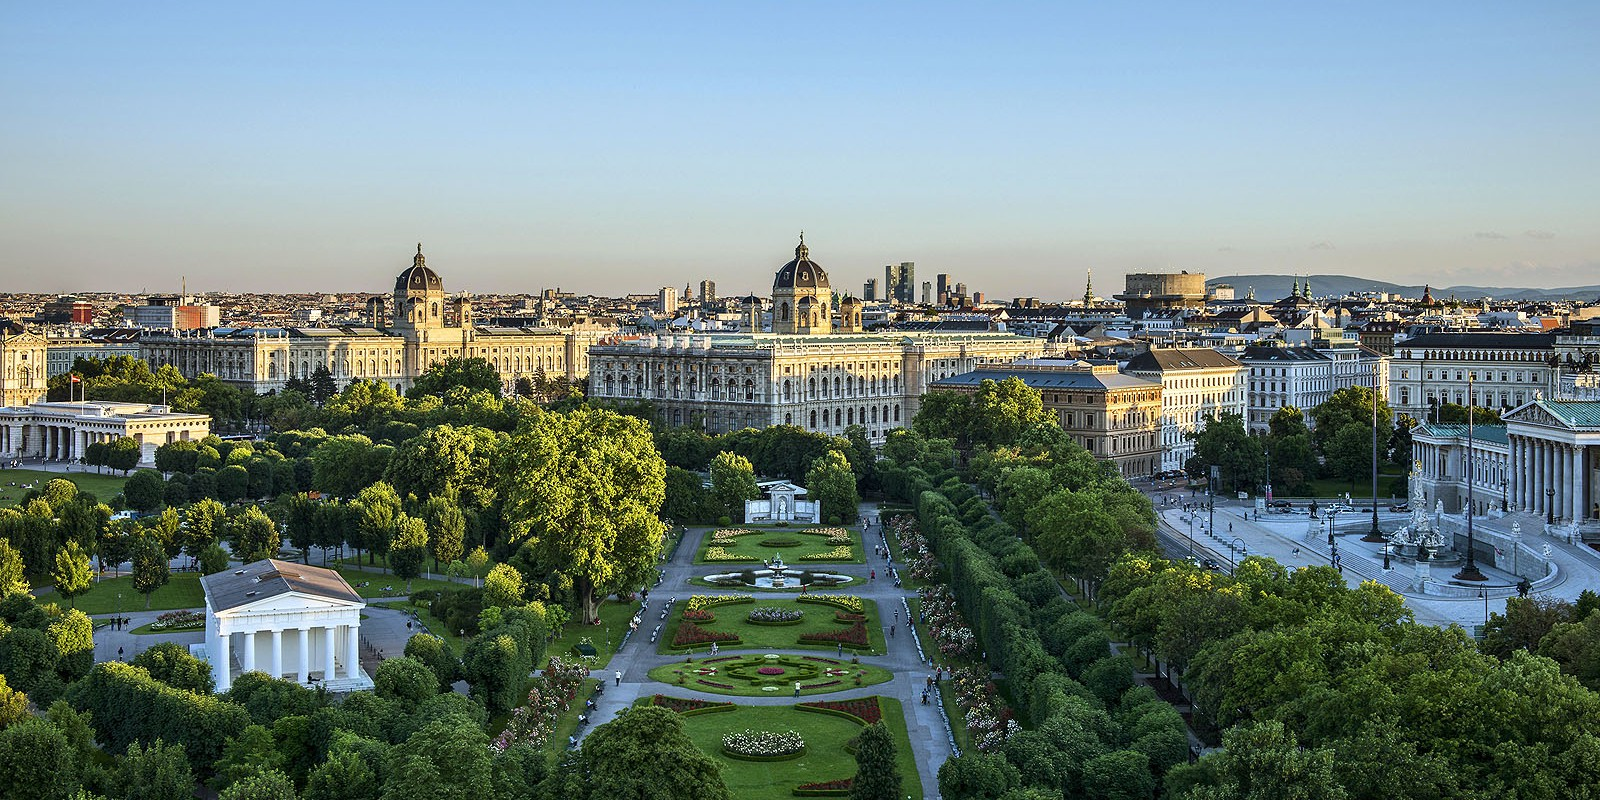 Velothon Vienna Reisepakete